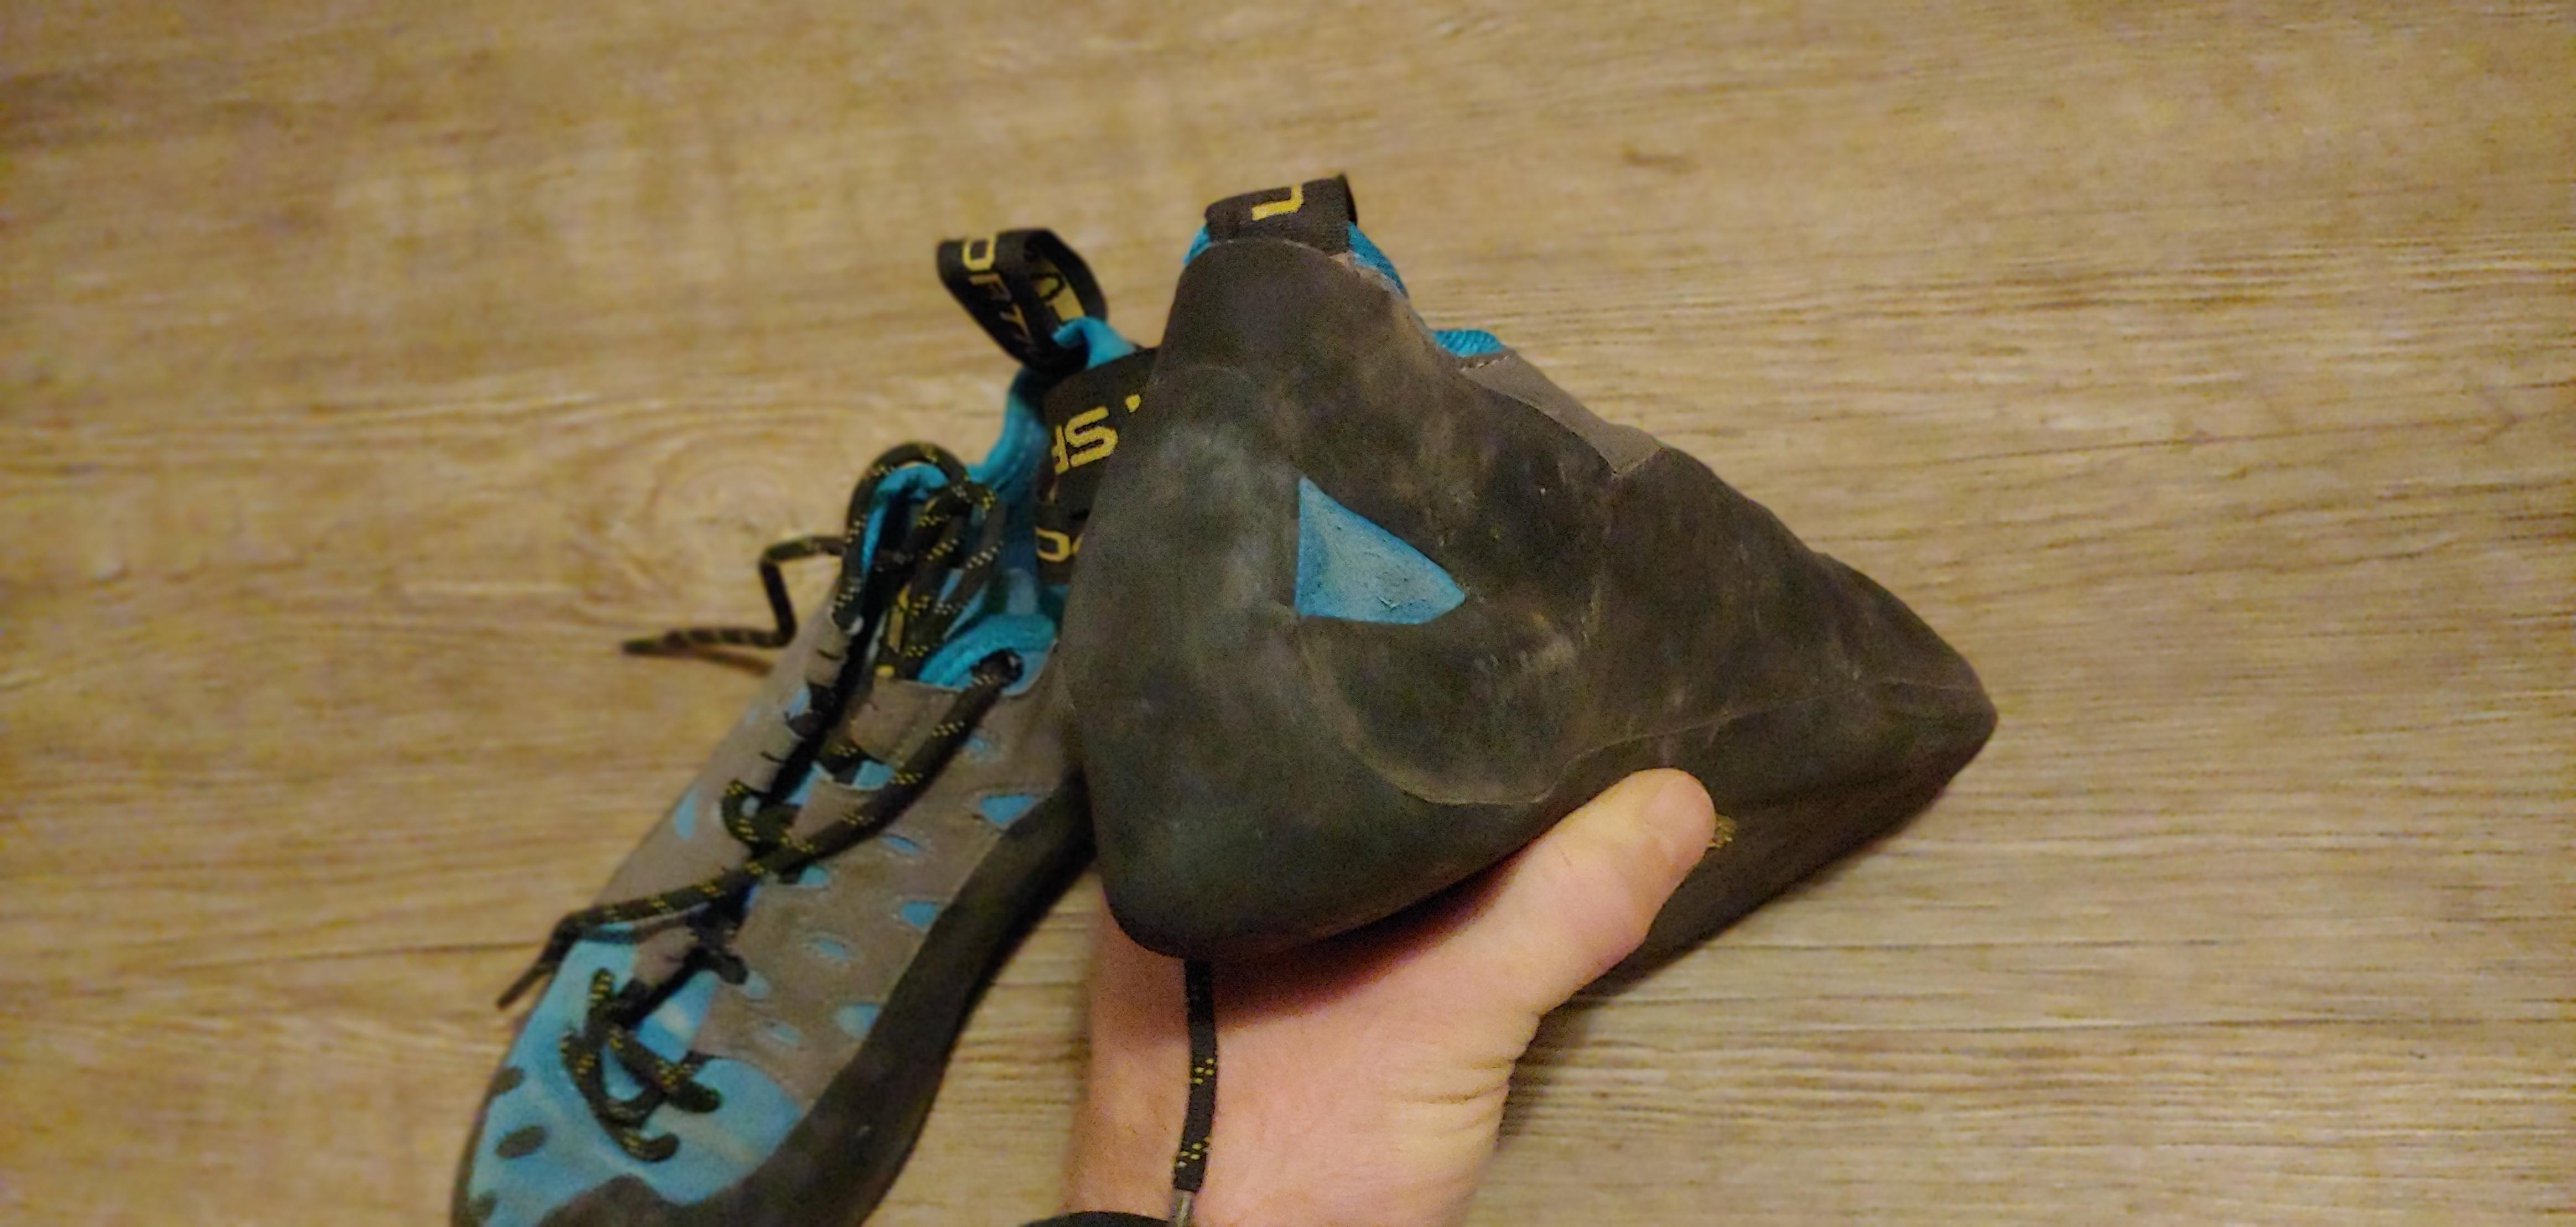 la sportiva tarantulace climbing shoe review